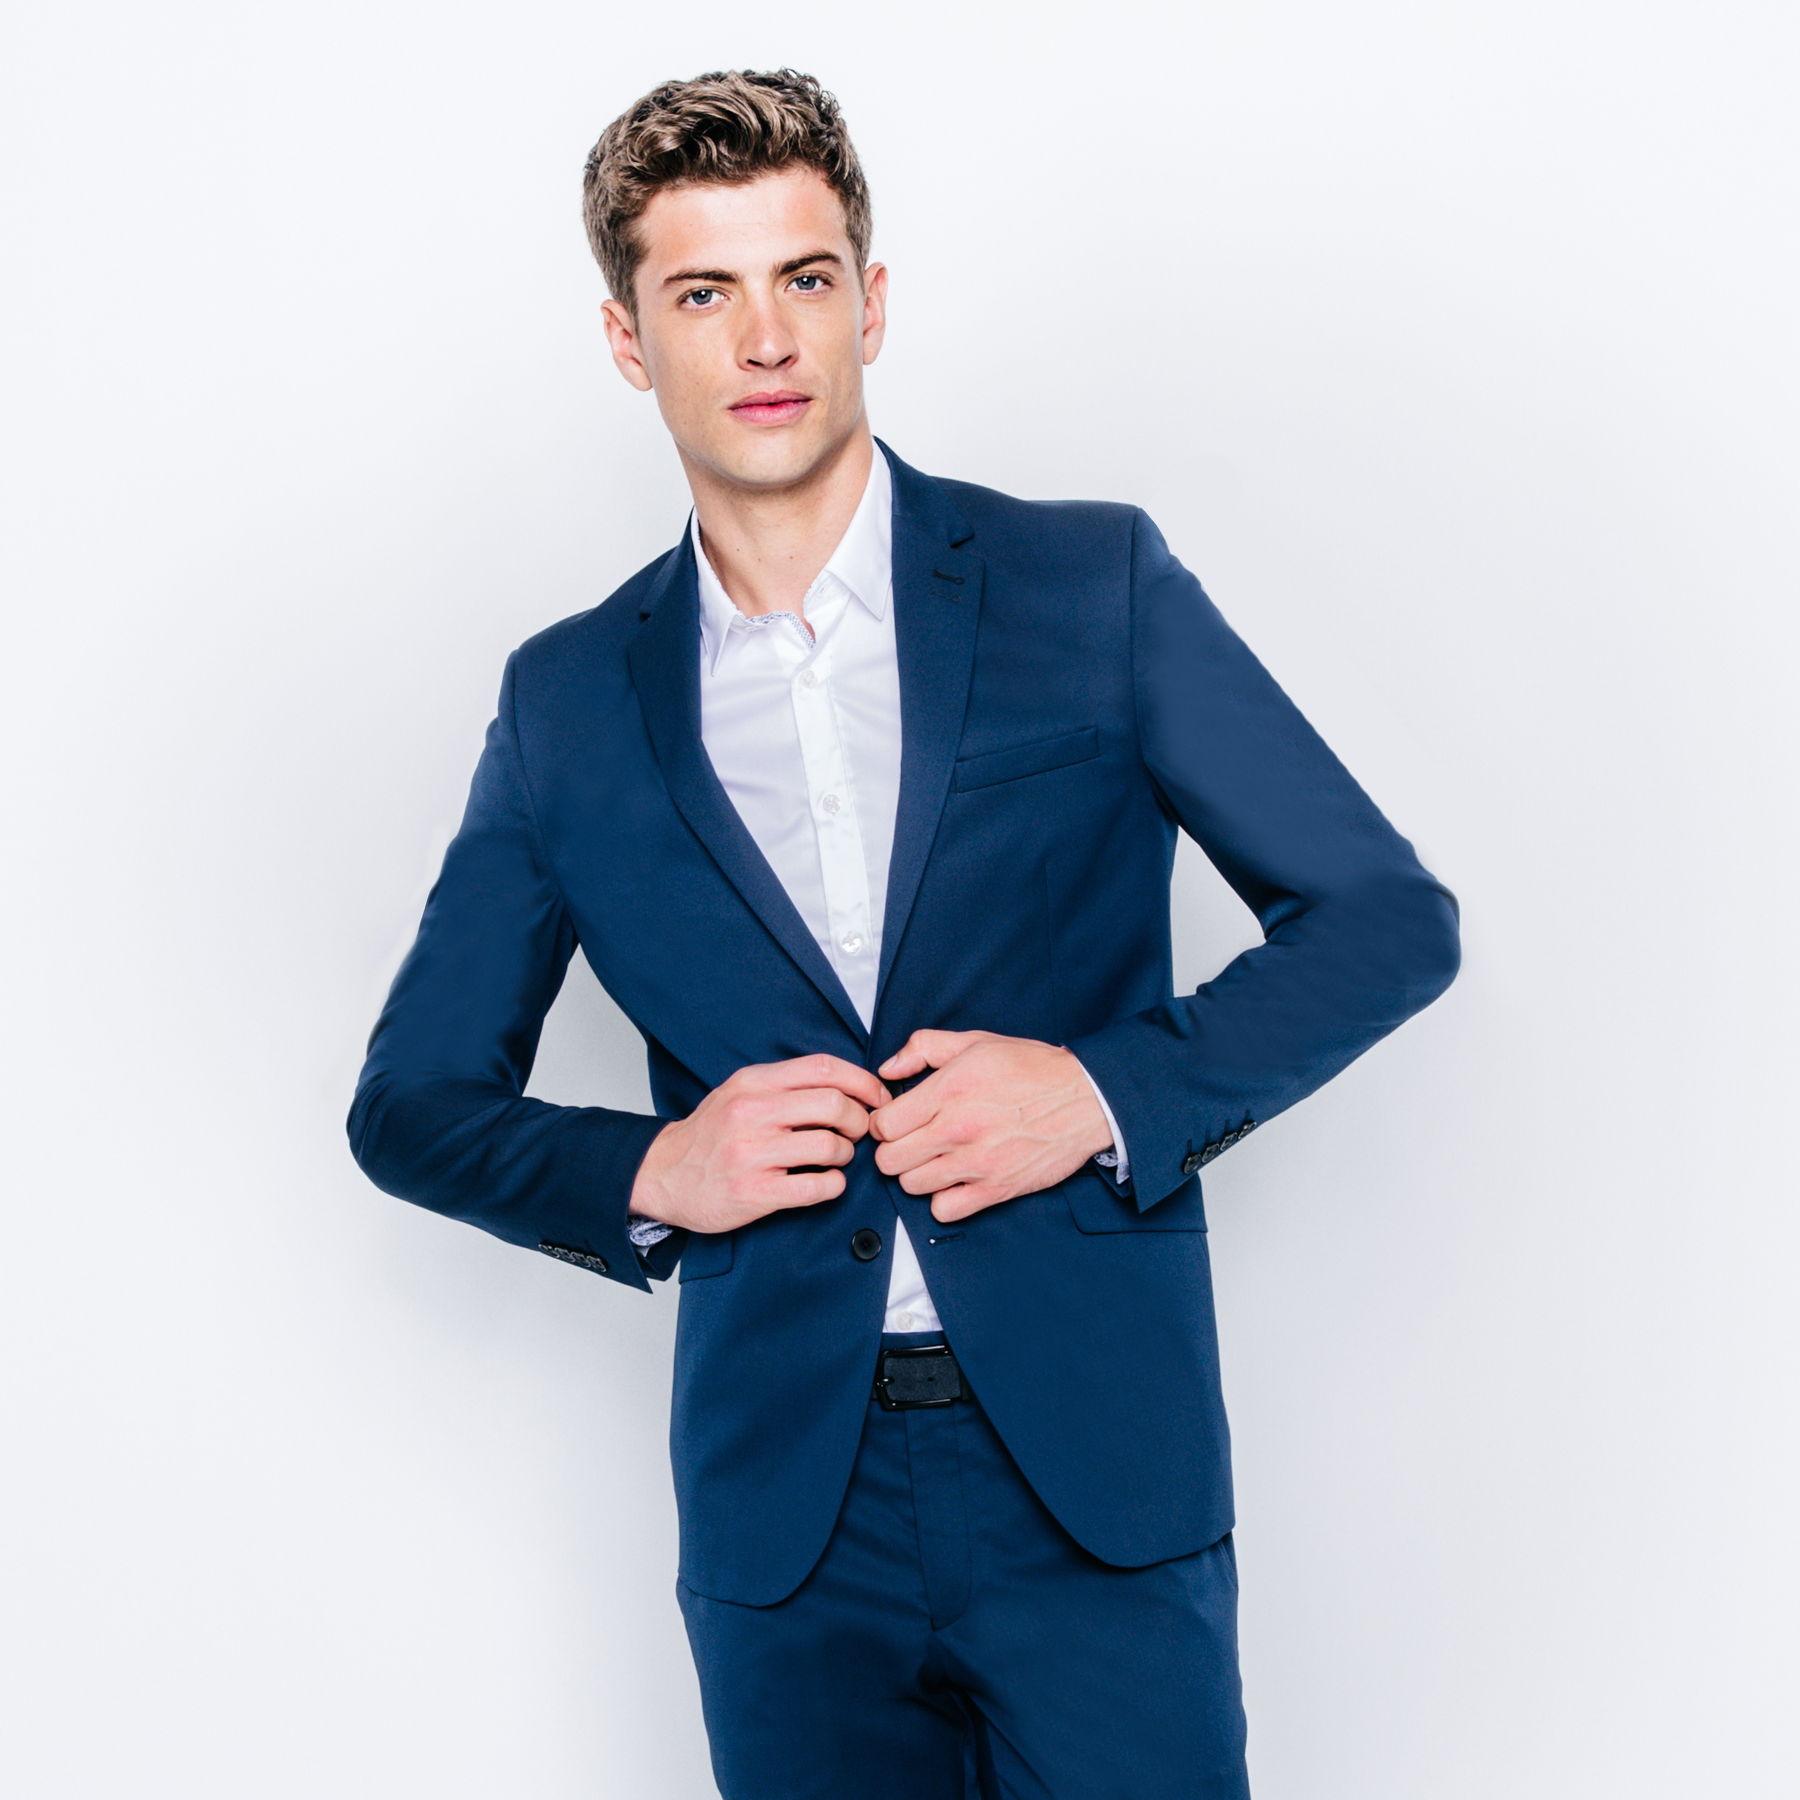 Marque costume homme